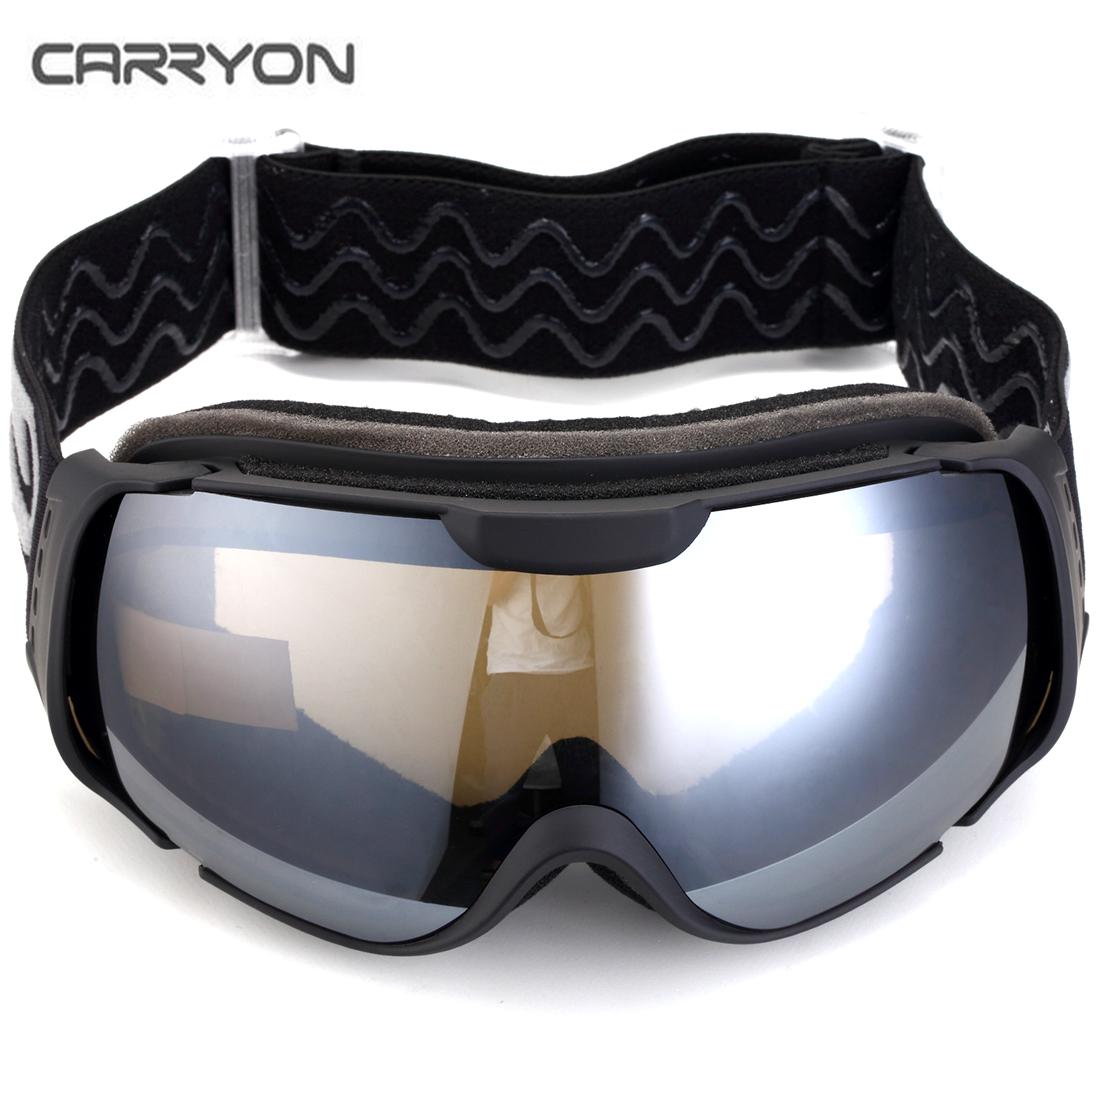 Carryon Authorized Kids Snowboard Goggles Ski Glasses Spherical Lens Anti-fog Anti-slip Strap Black